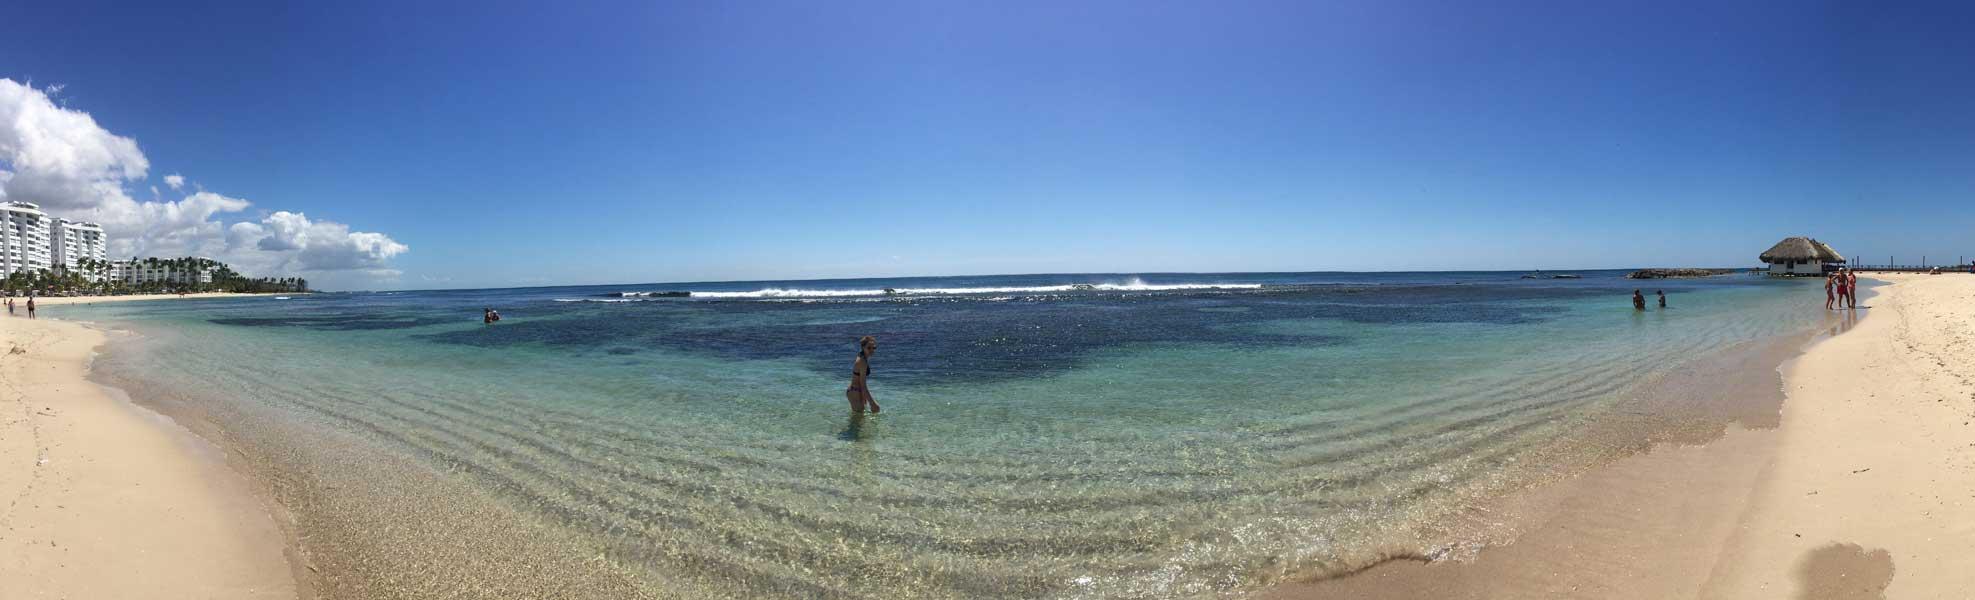 Costa-Del-Sol-1-Juan-Dolio-Beach